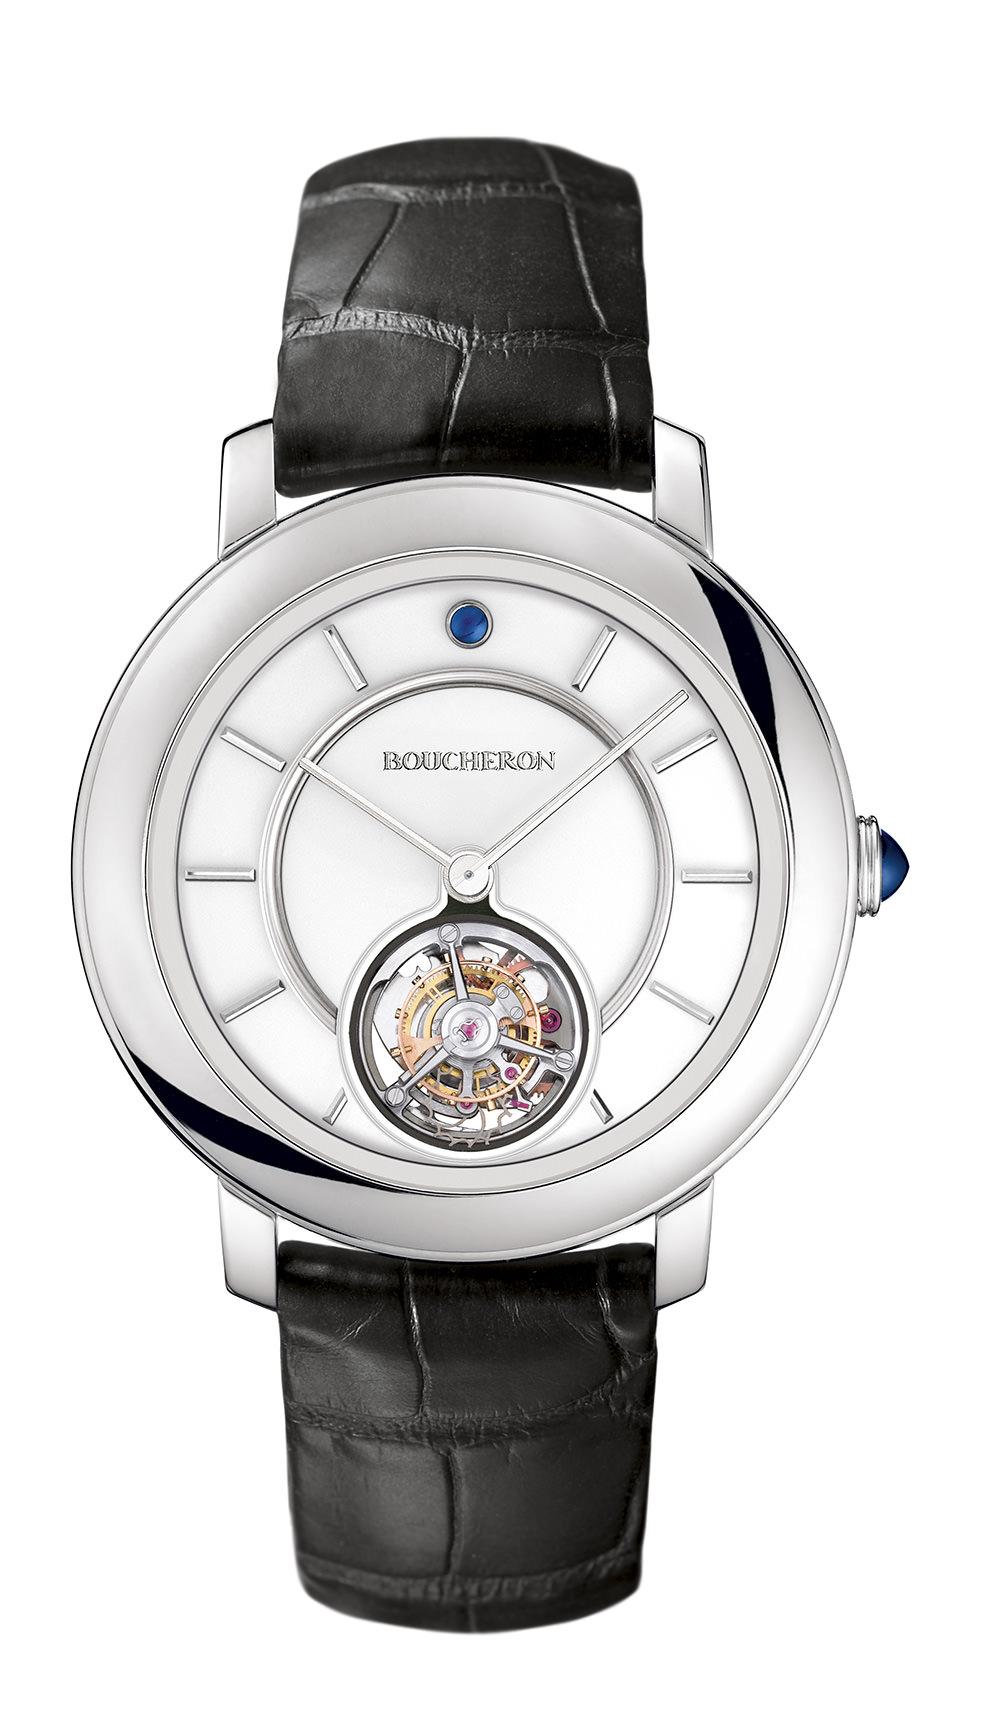 Reloj Epure Boucheron Tourbillon 43 mm